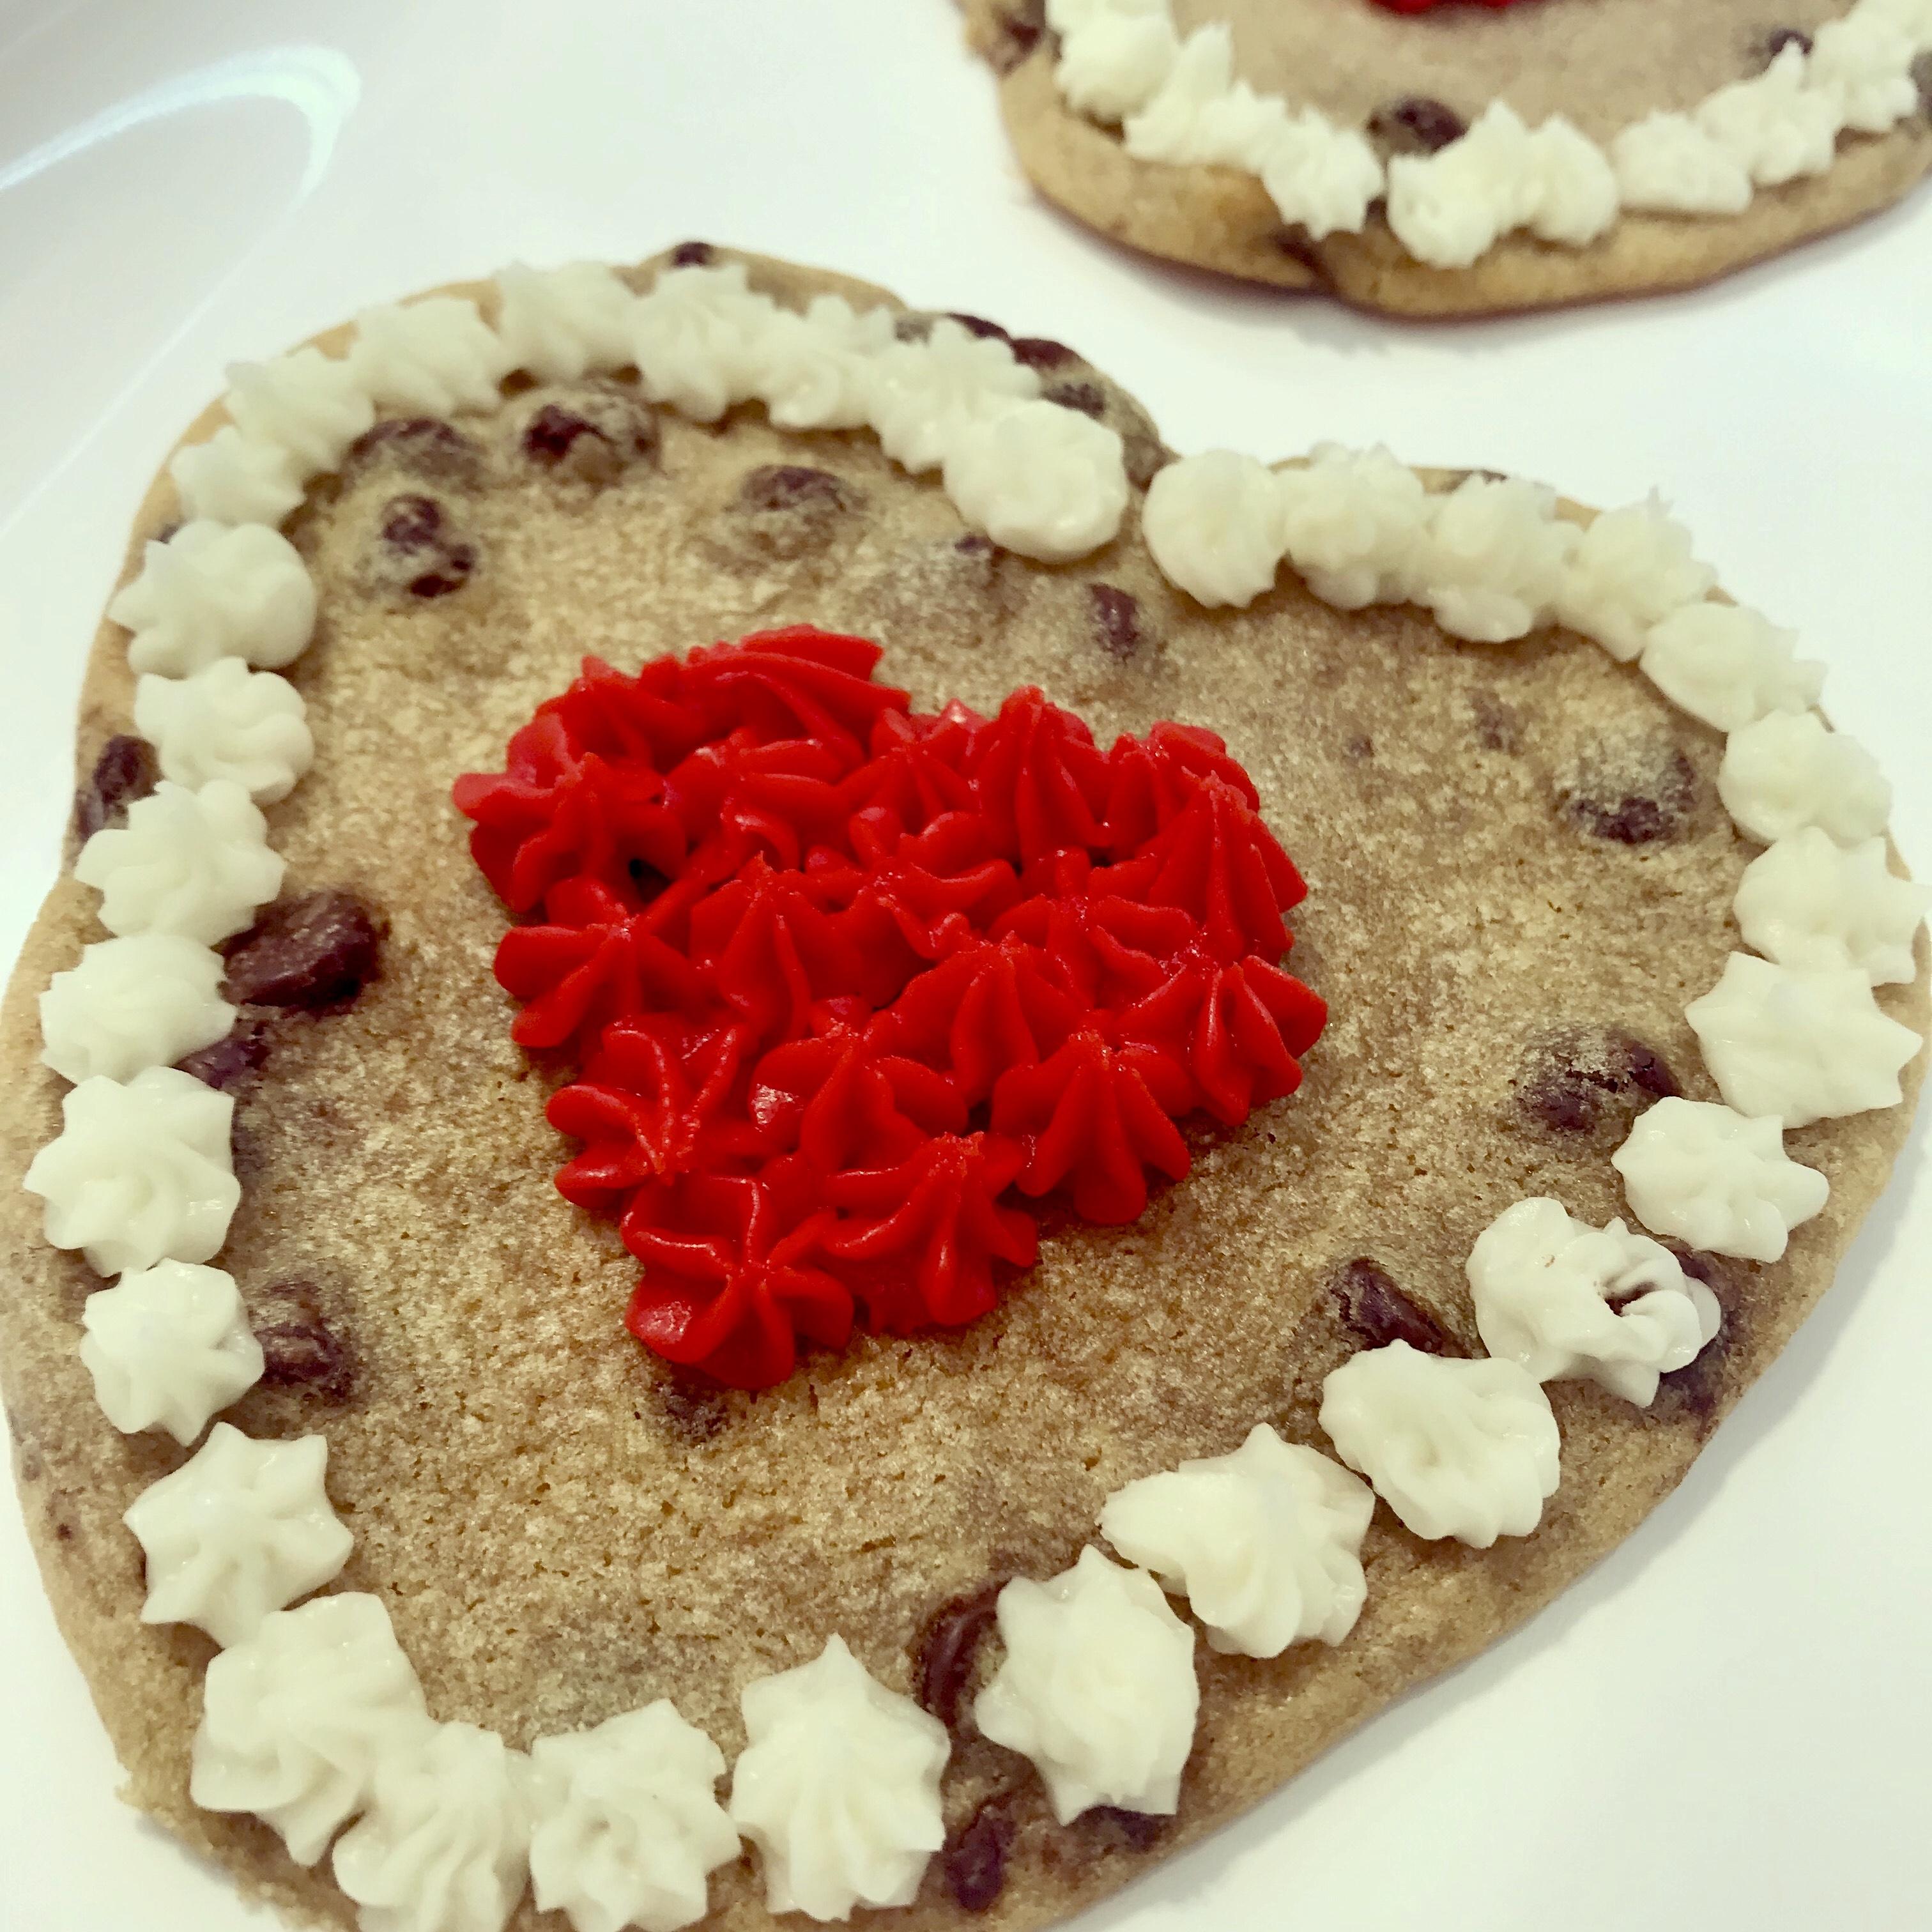 https://0201.nccdn.net/1_2/000/000/08f/33d/valentine-cookie.jpg